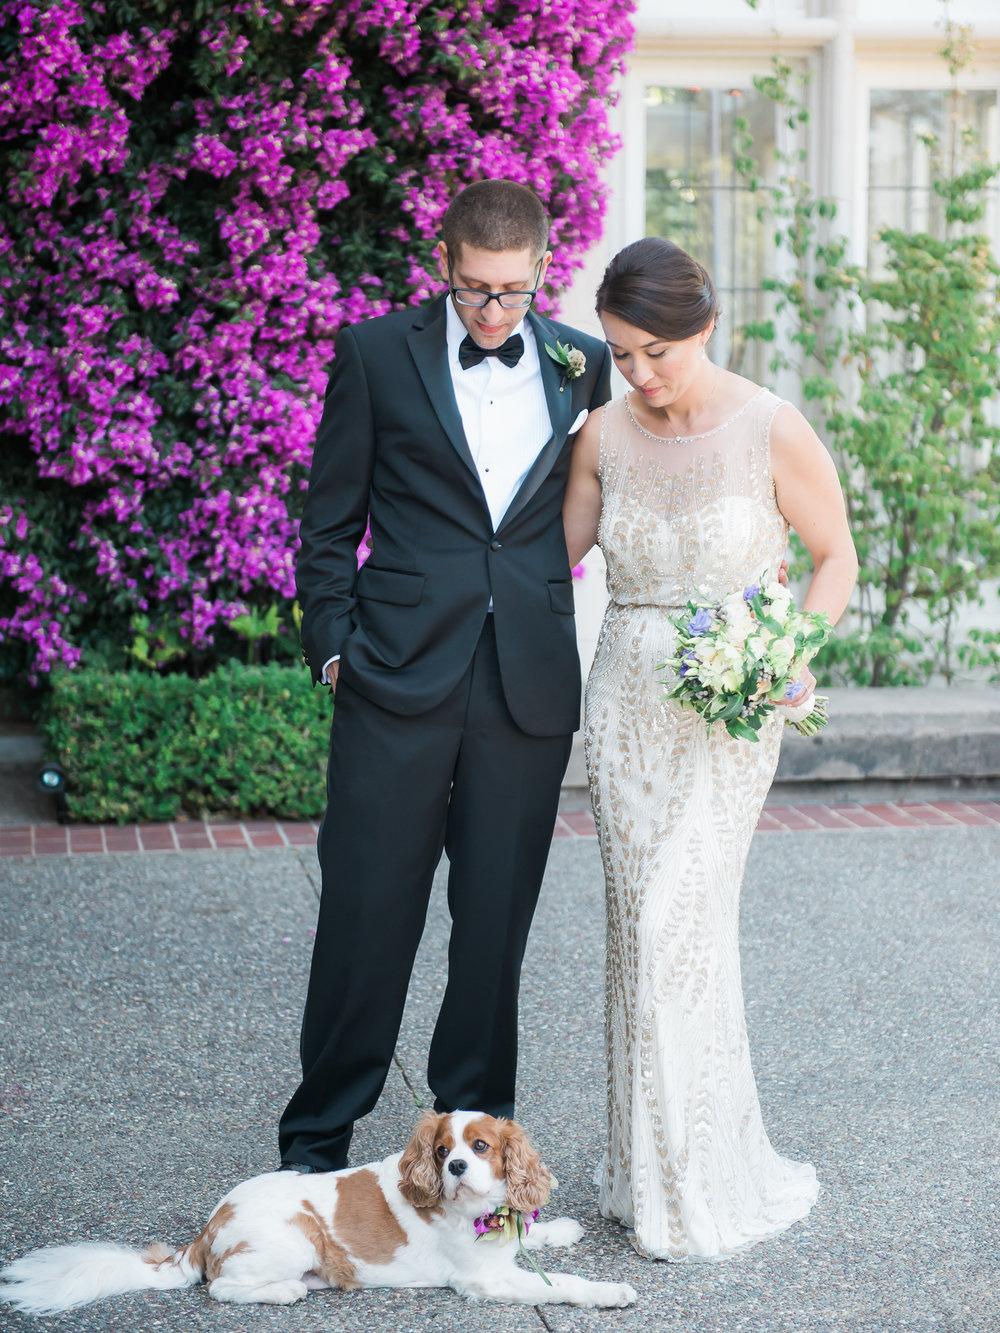 Sarah+Warren_wedding_spp-54.jpg